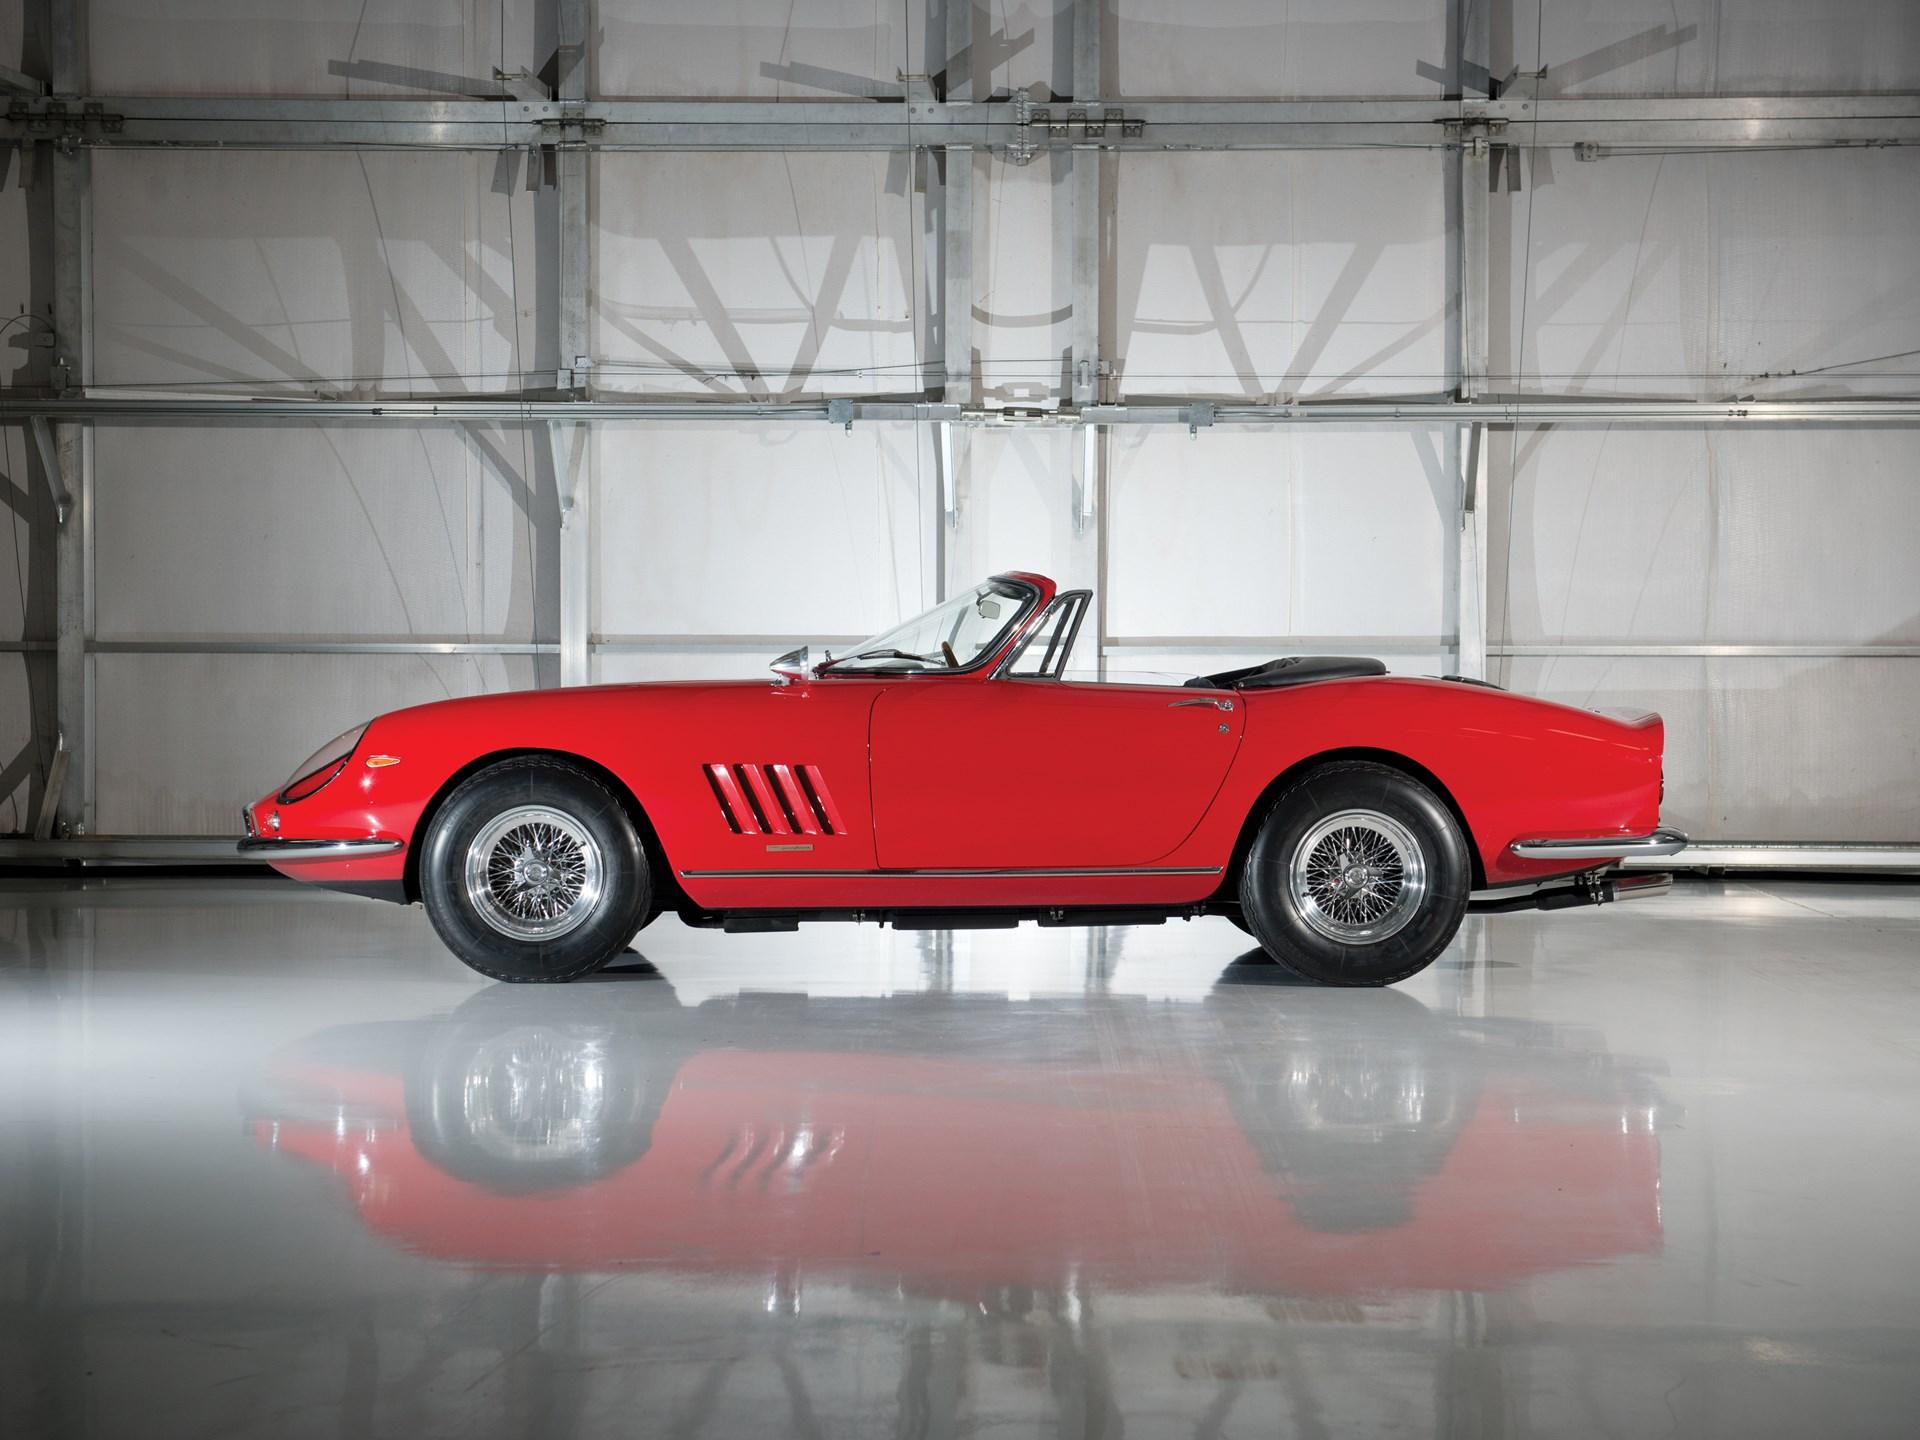 1967 Ferrari 275 GTB/4*S N.A.R.T. Spider by Scaglietti